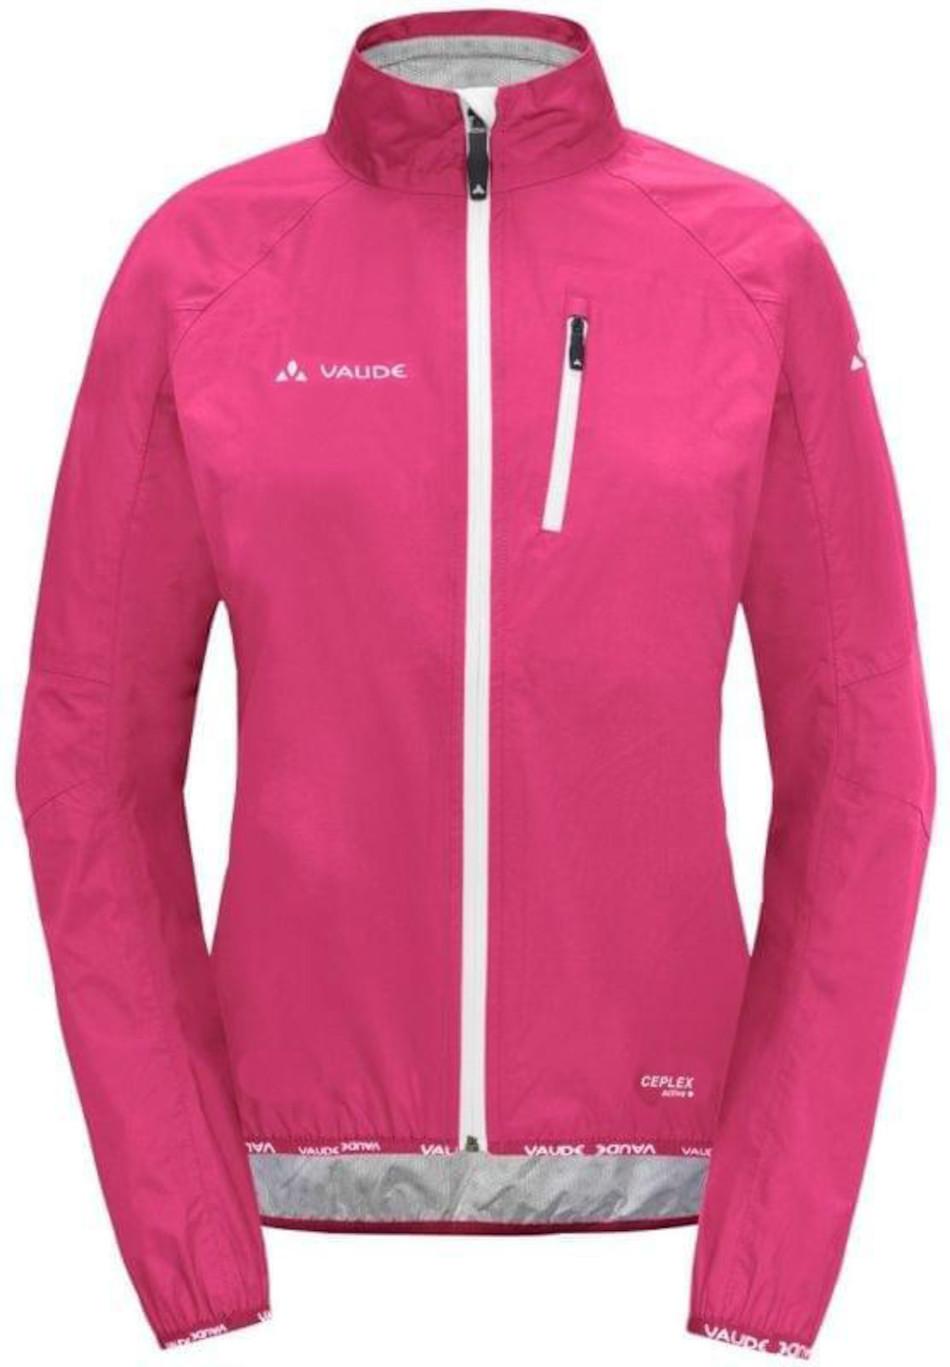 online store 3fb6d 33604 Vaude Drop 2 Women's Waterproof Cycling Jacket | On - One